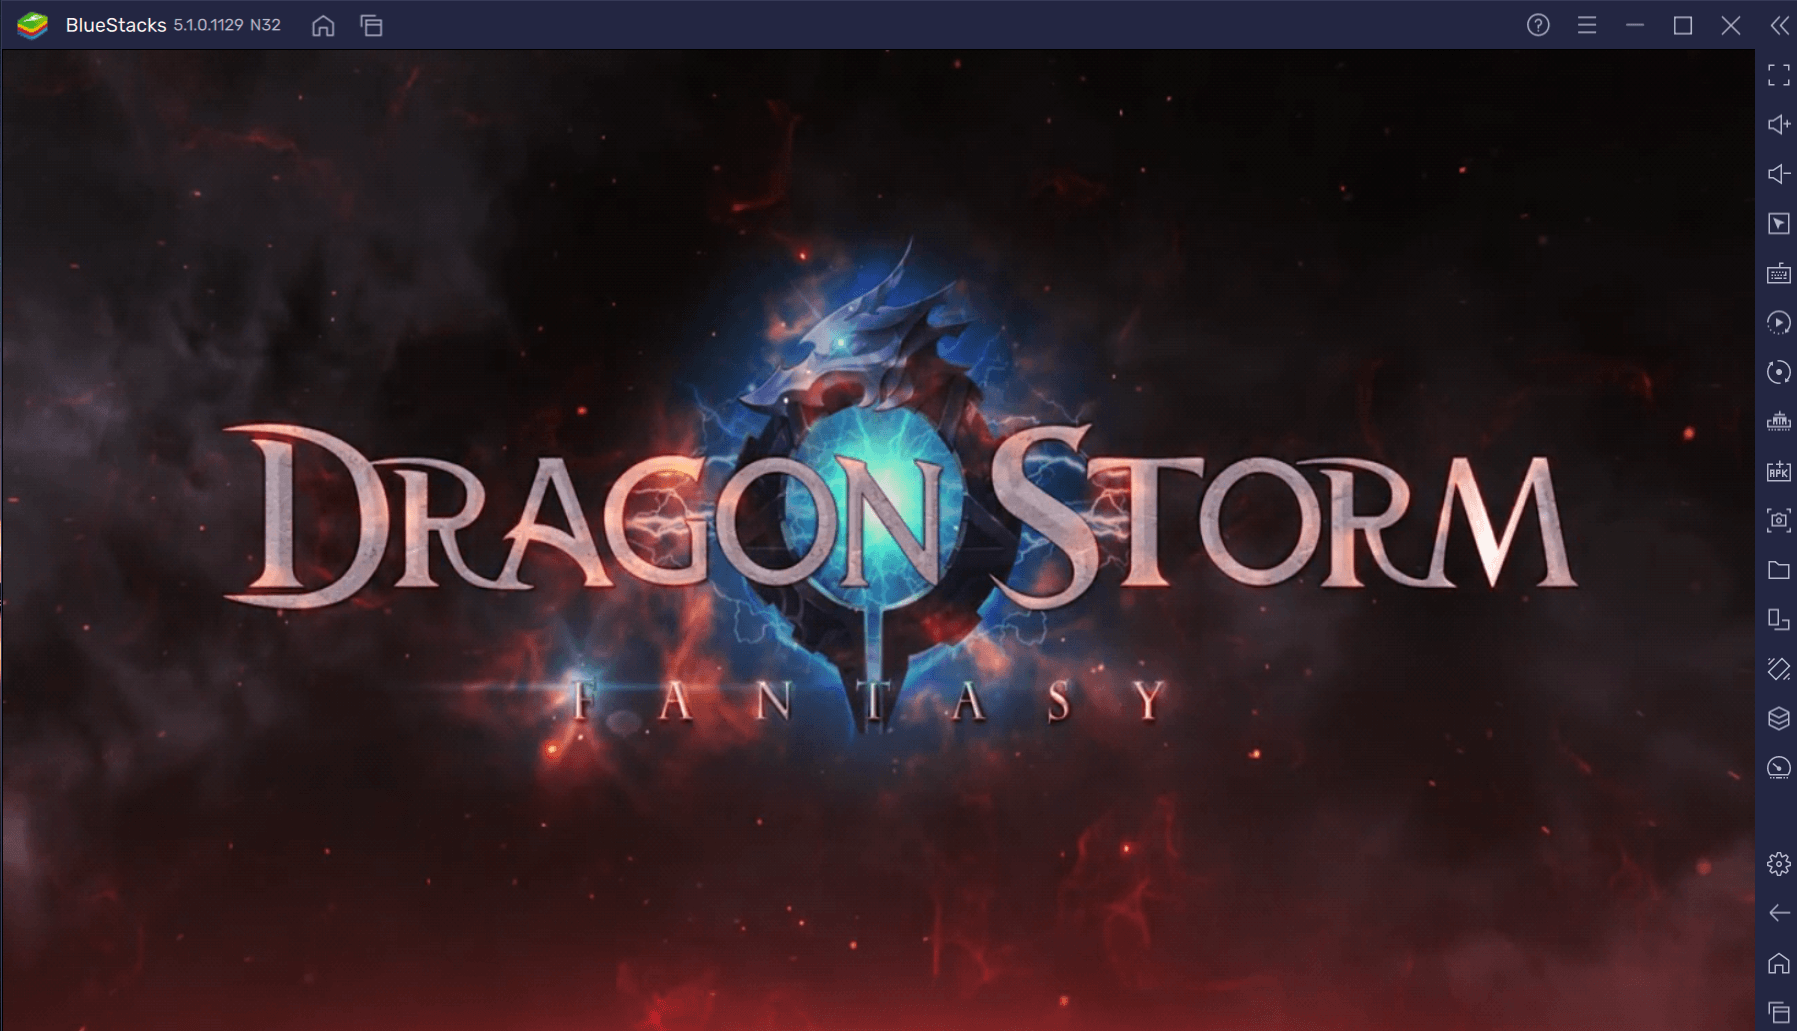 Guia de Iniciantes de Dragon Storm Fantasy para focar no que realmente importa